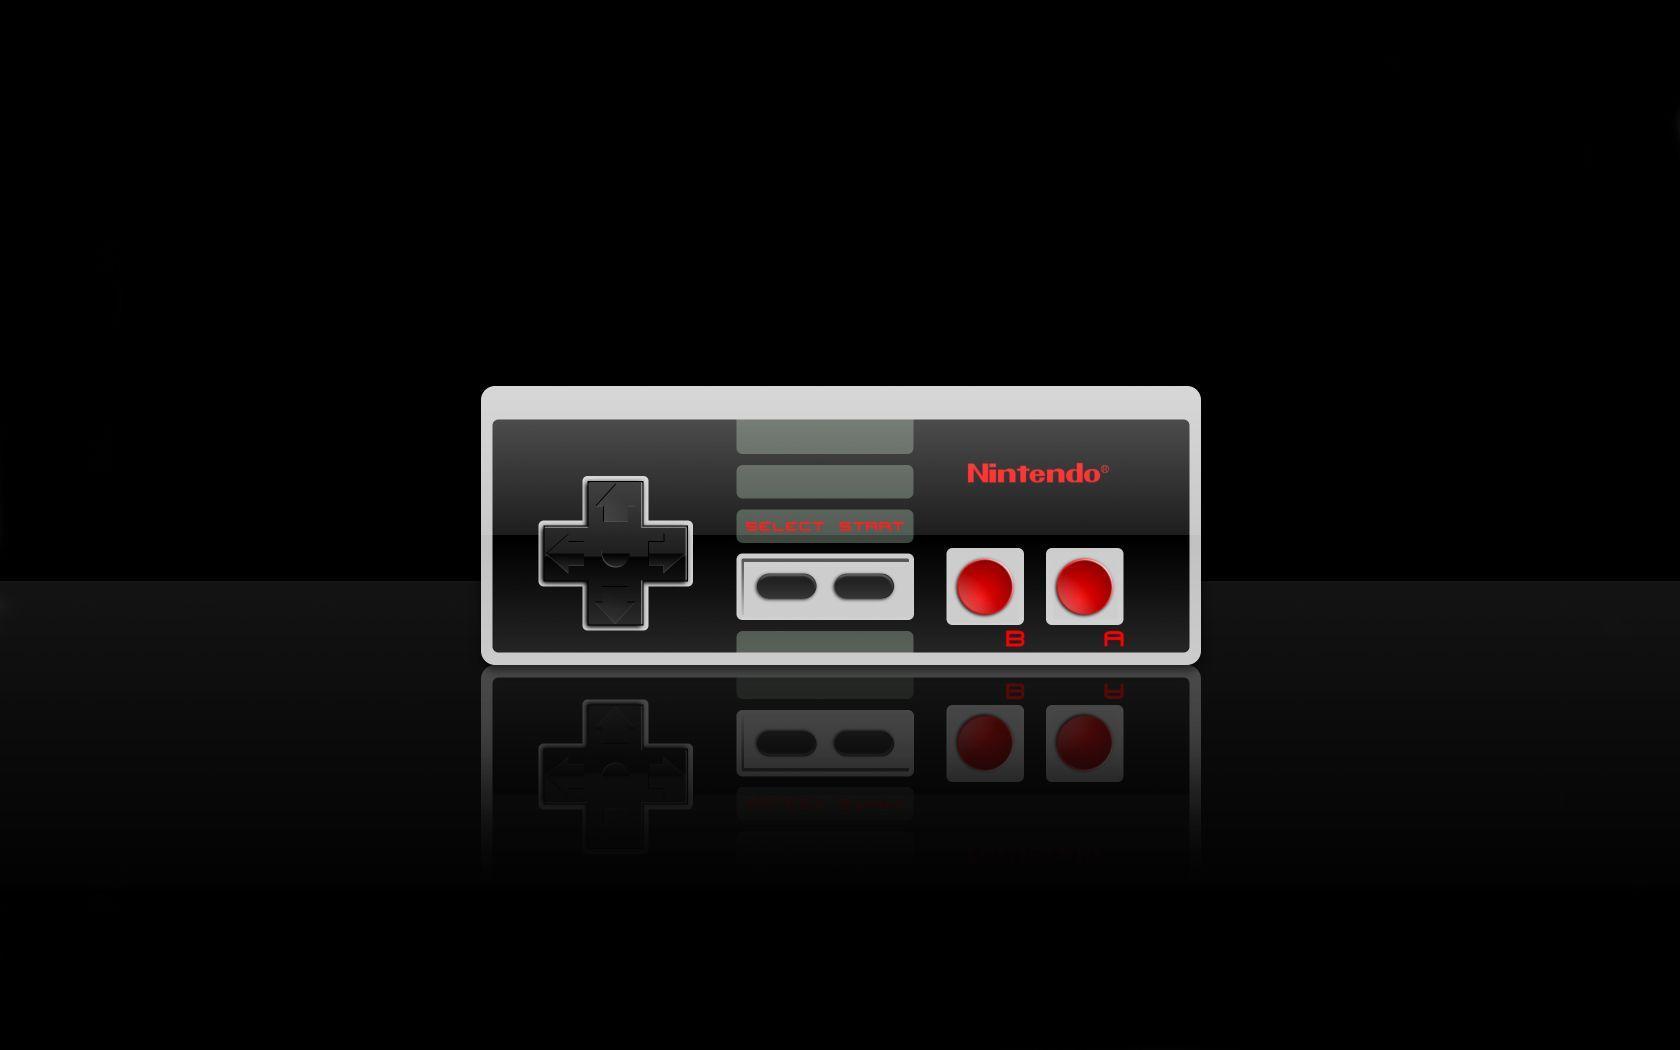 Nintendo Controller Wallpapers Top Free Nintendo